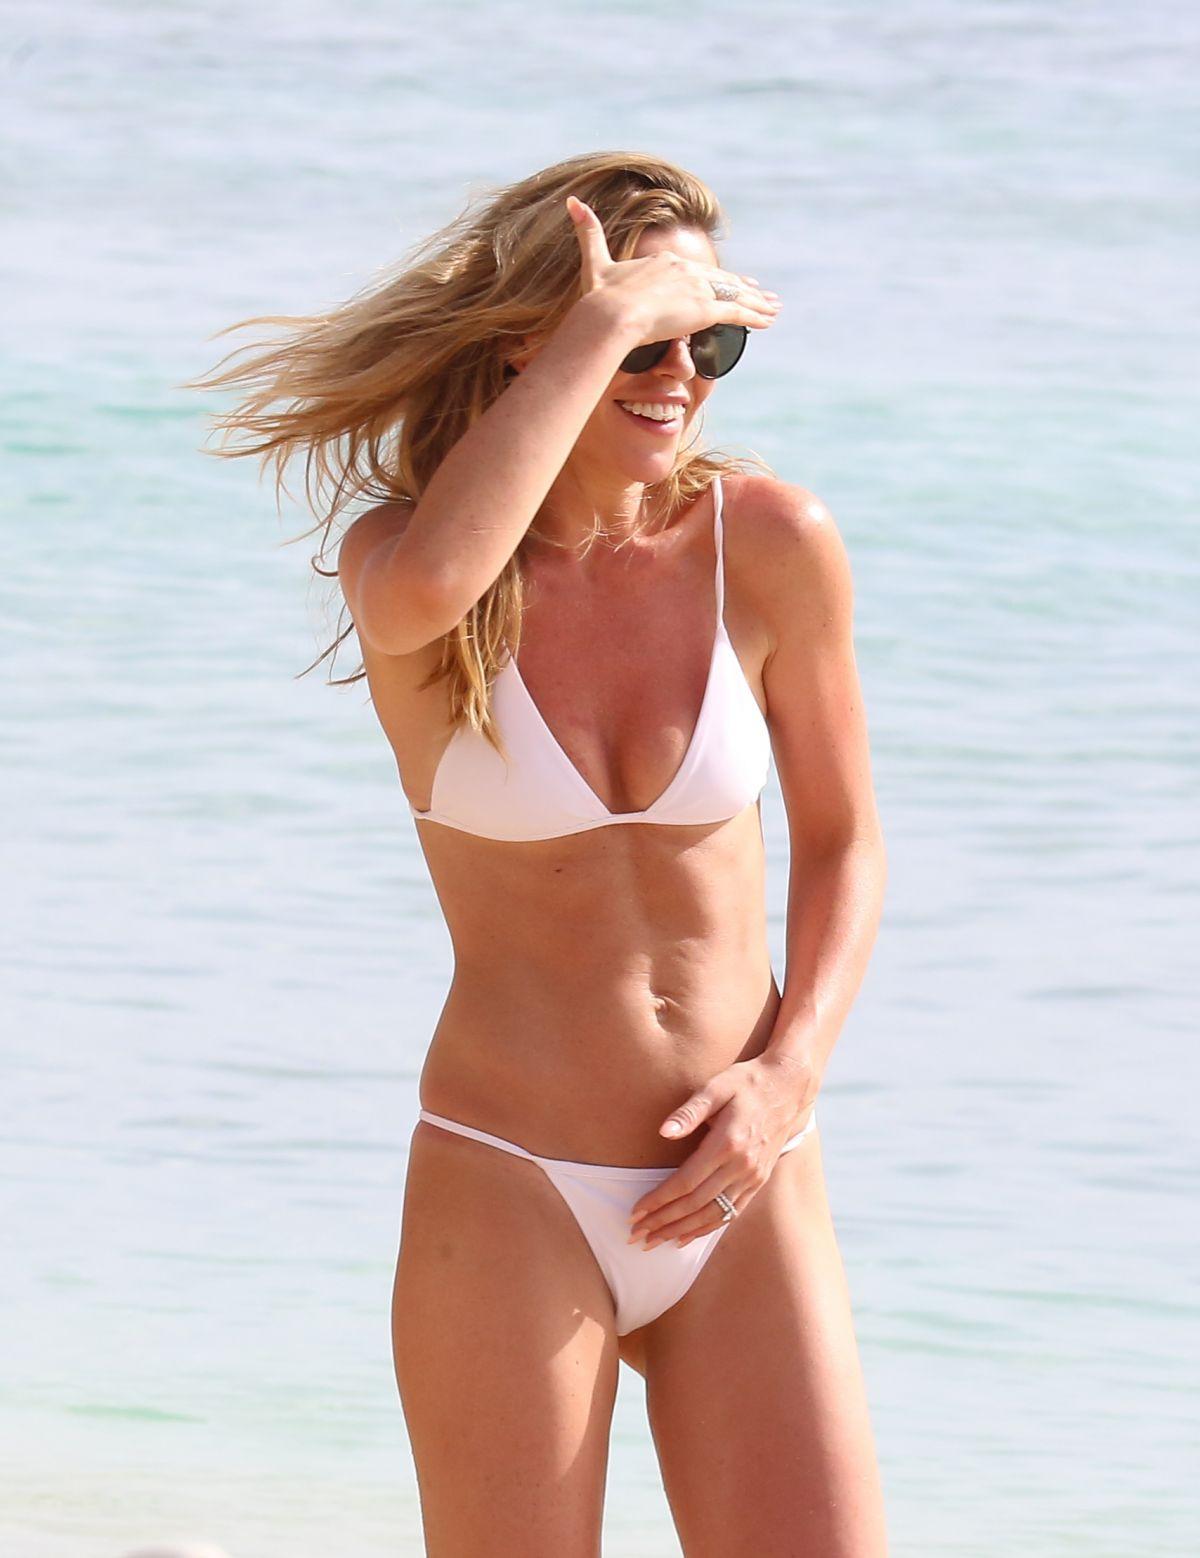 Bikini Abbey Clancy nude photos 2019